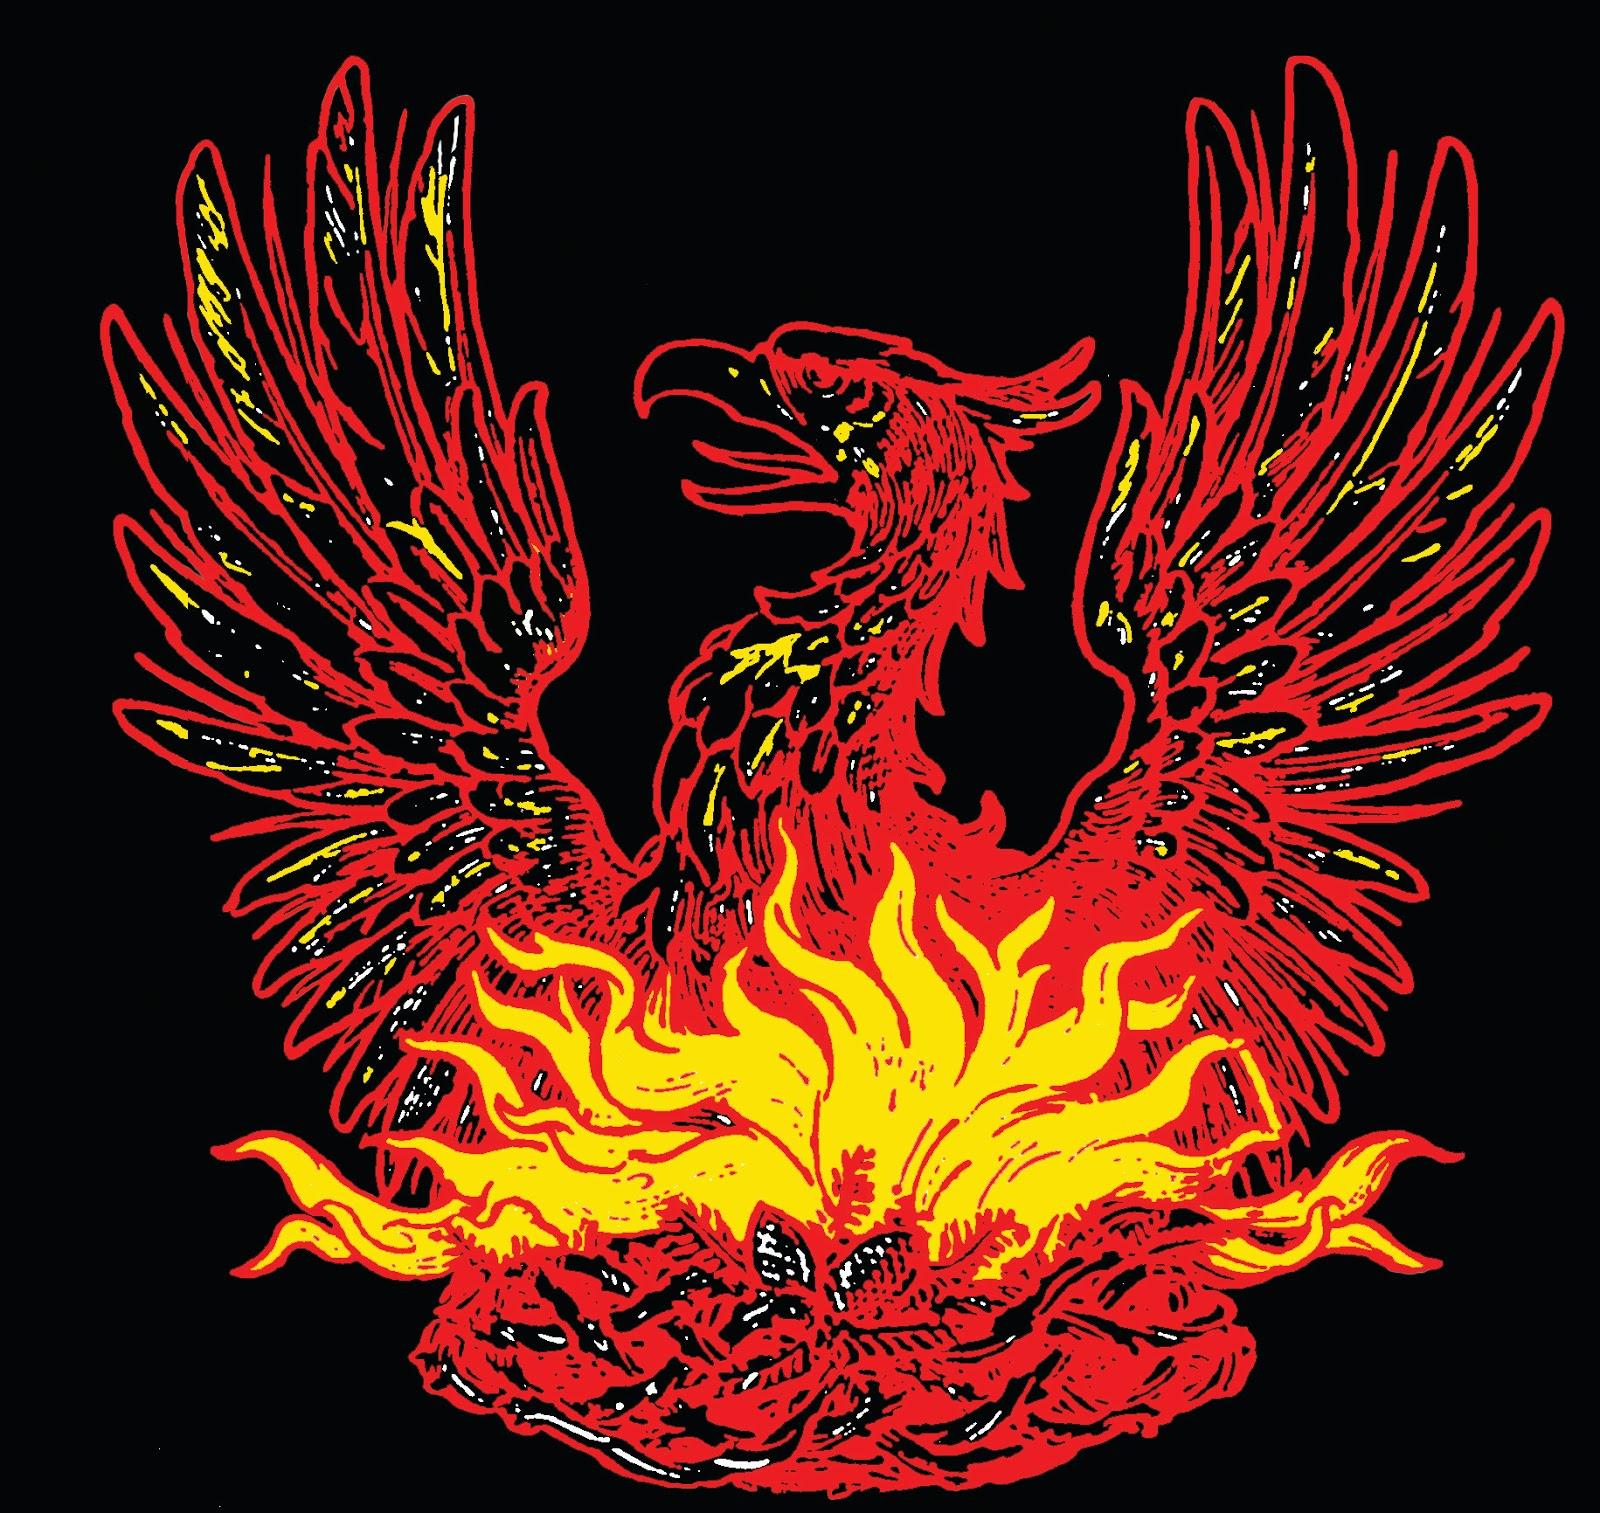 personal ethics statement university of phoenix